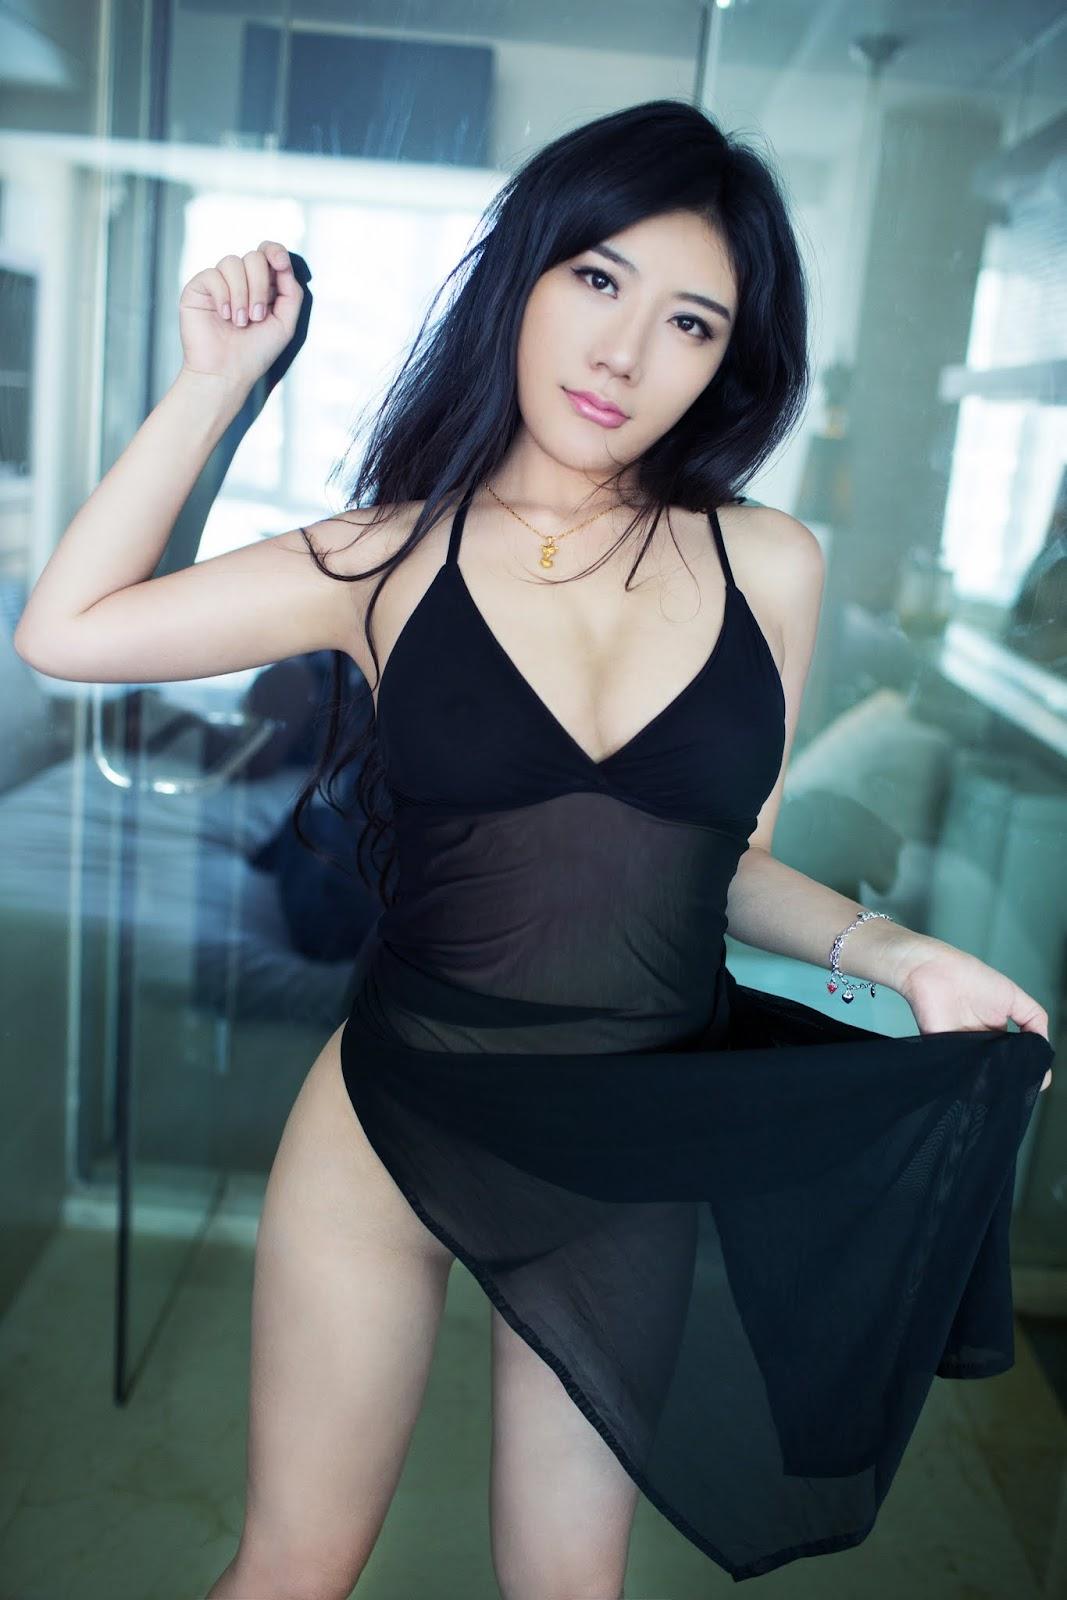 %25C2%25AC%252BO 30 - Hot Sexy Model TUIGIRL NO.46 Nude